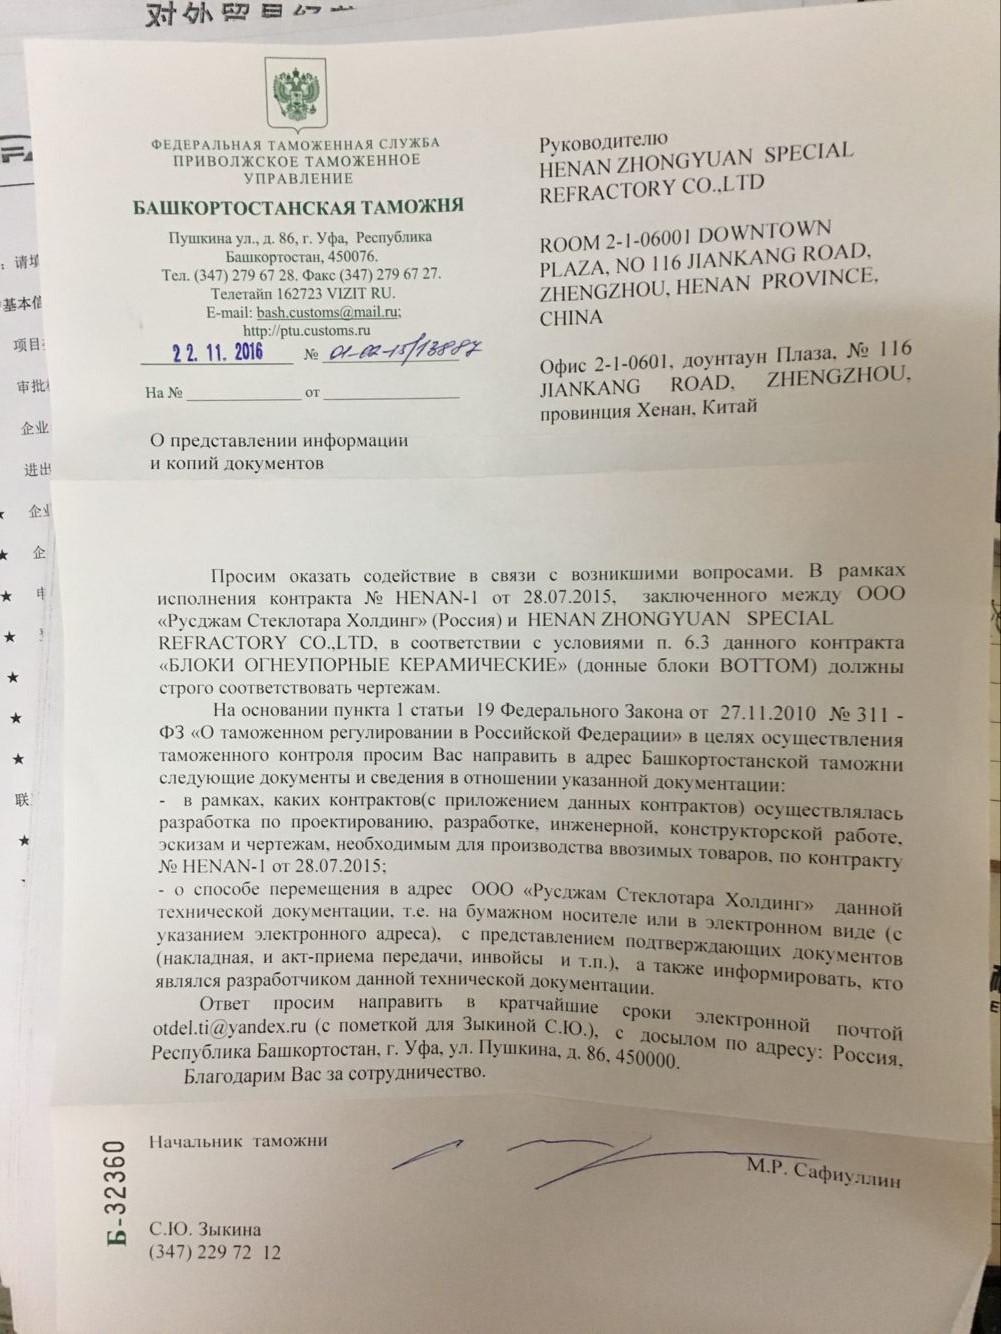 RTN认证,俄罗斯RTN安装使用许可证RosTechNadzor(RTN)